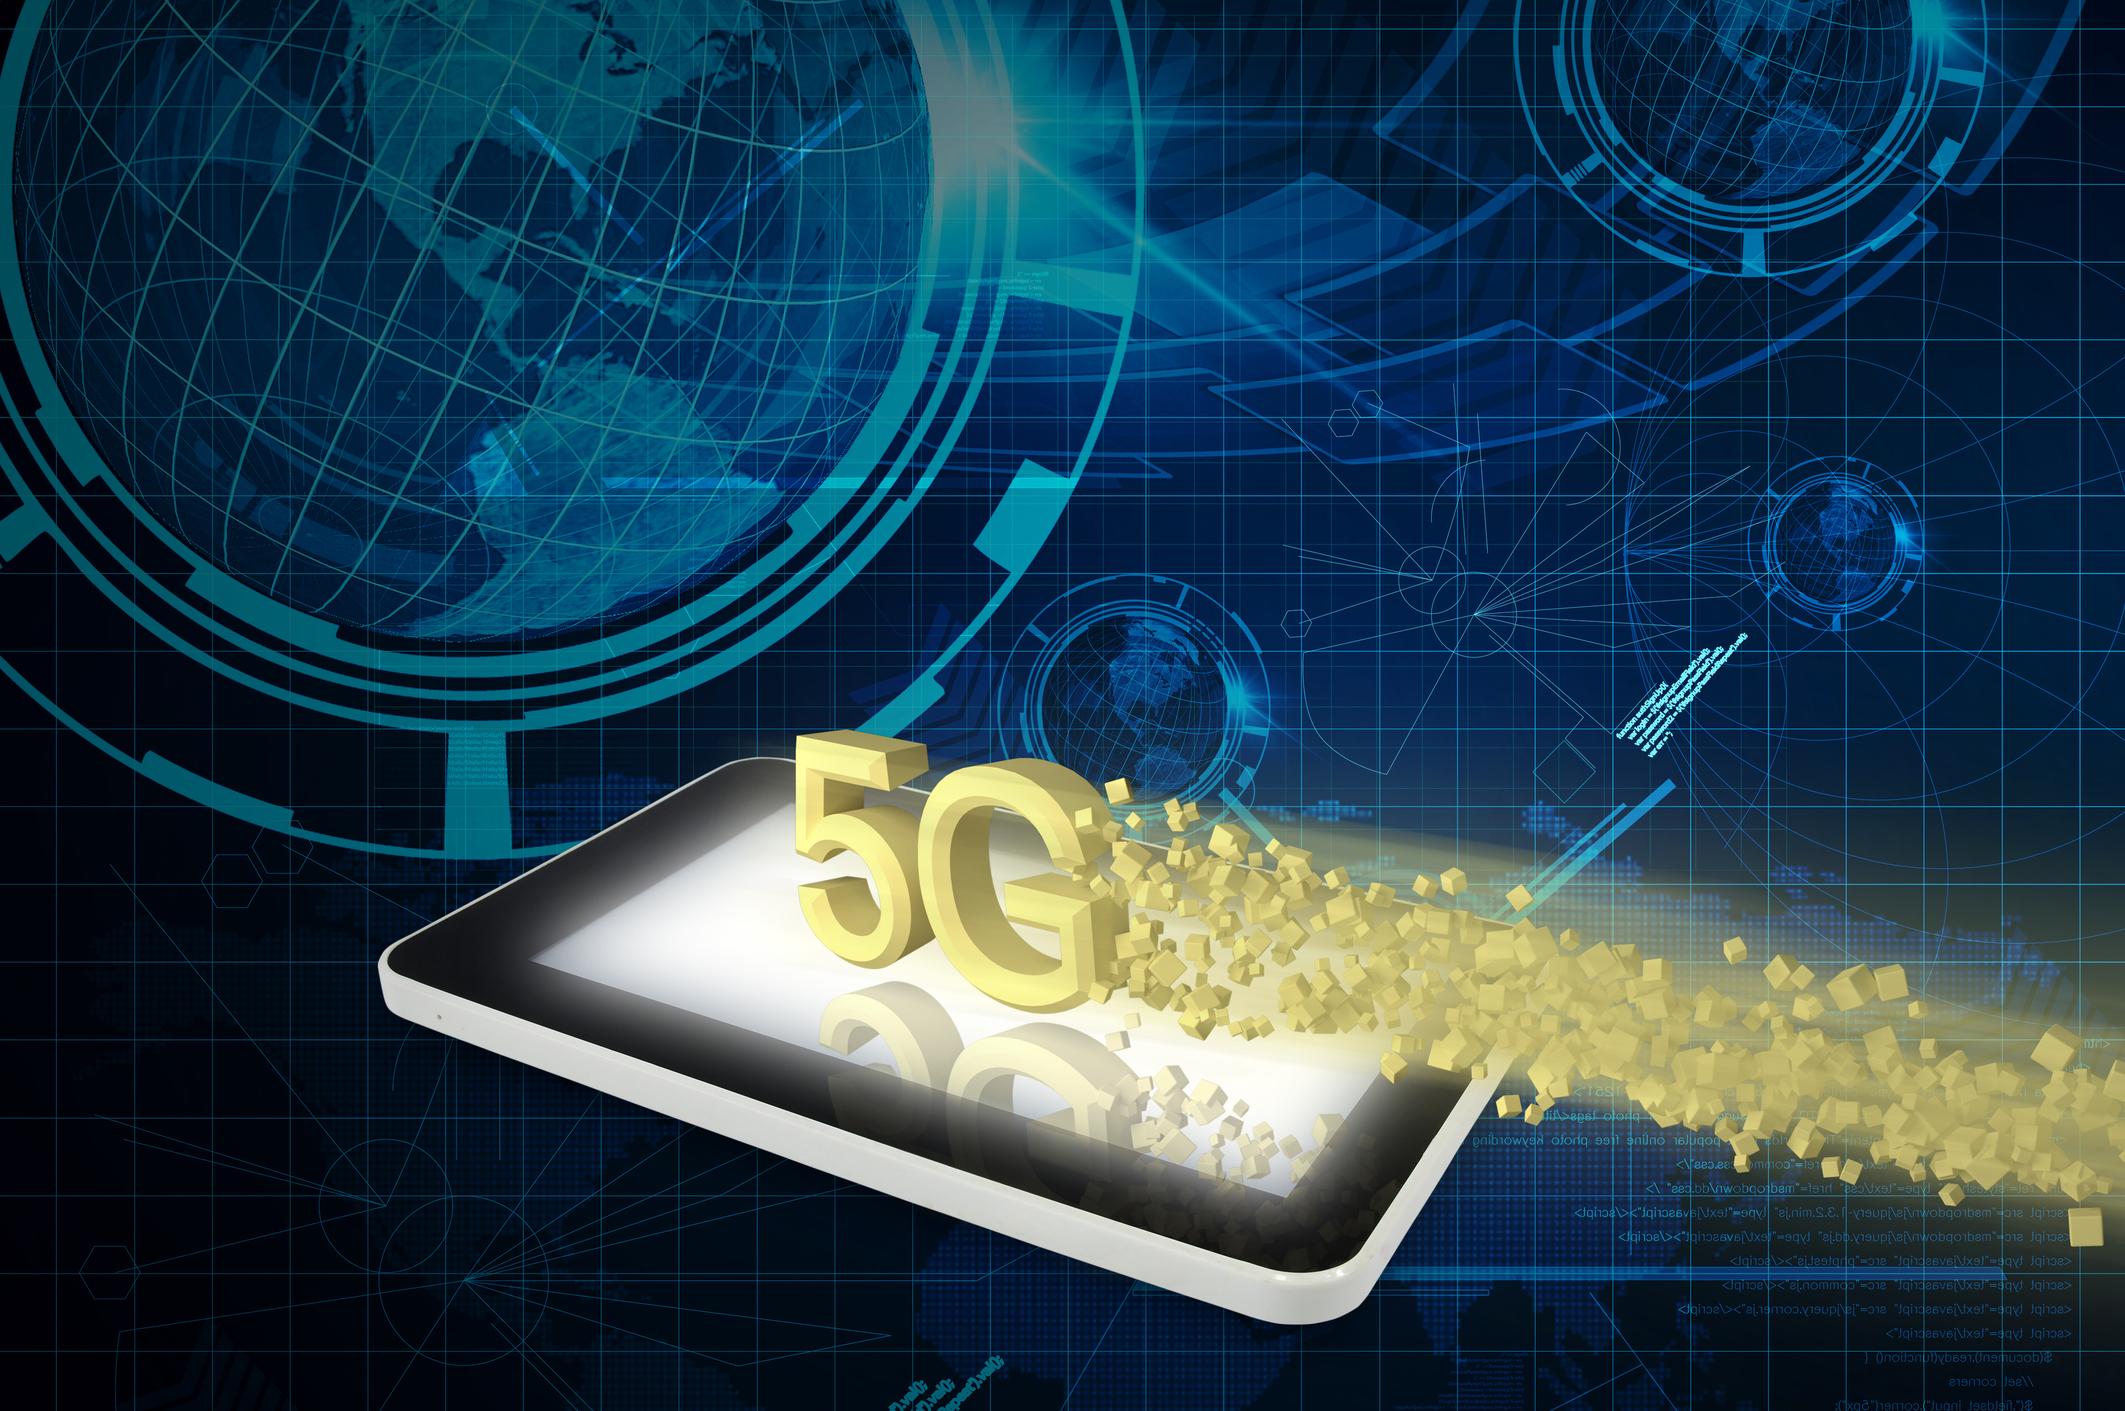 5G spraying off tablet